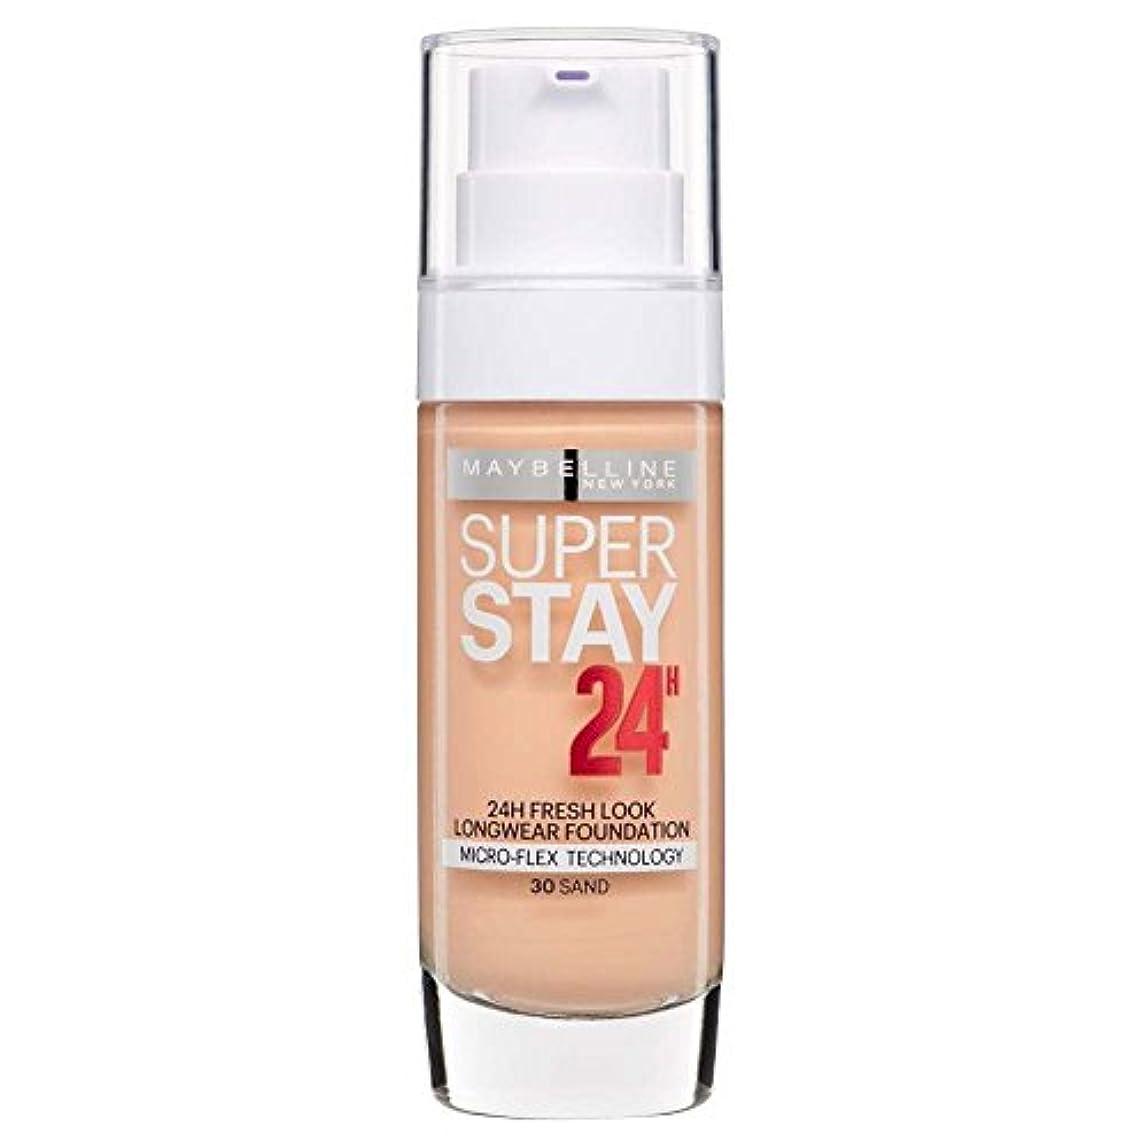 2 x Maybelline Superstay 24H Fresh Look Longwear Foundation 30ml - 030 Sand